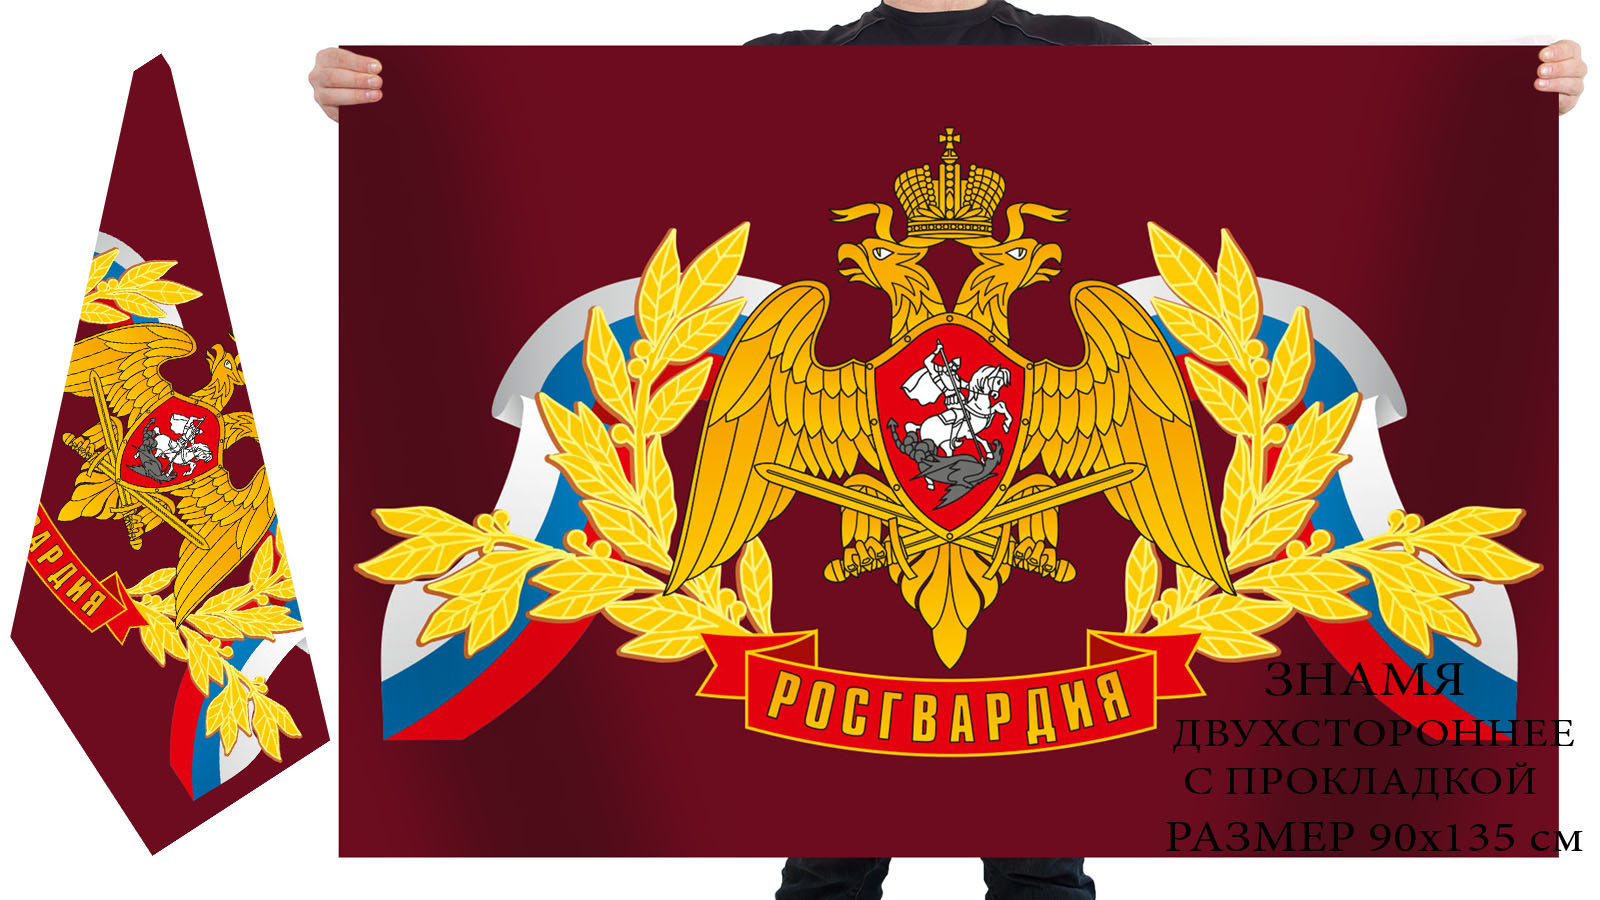 Двусторонний флаг с эмблемой Росгвардии